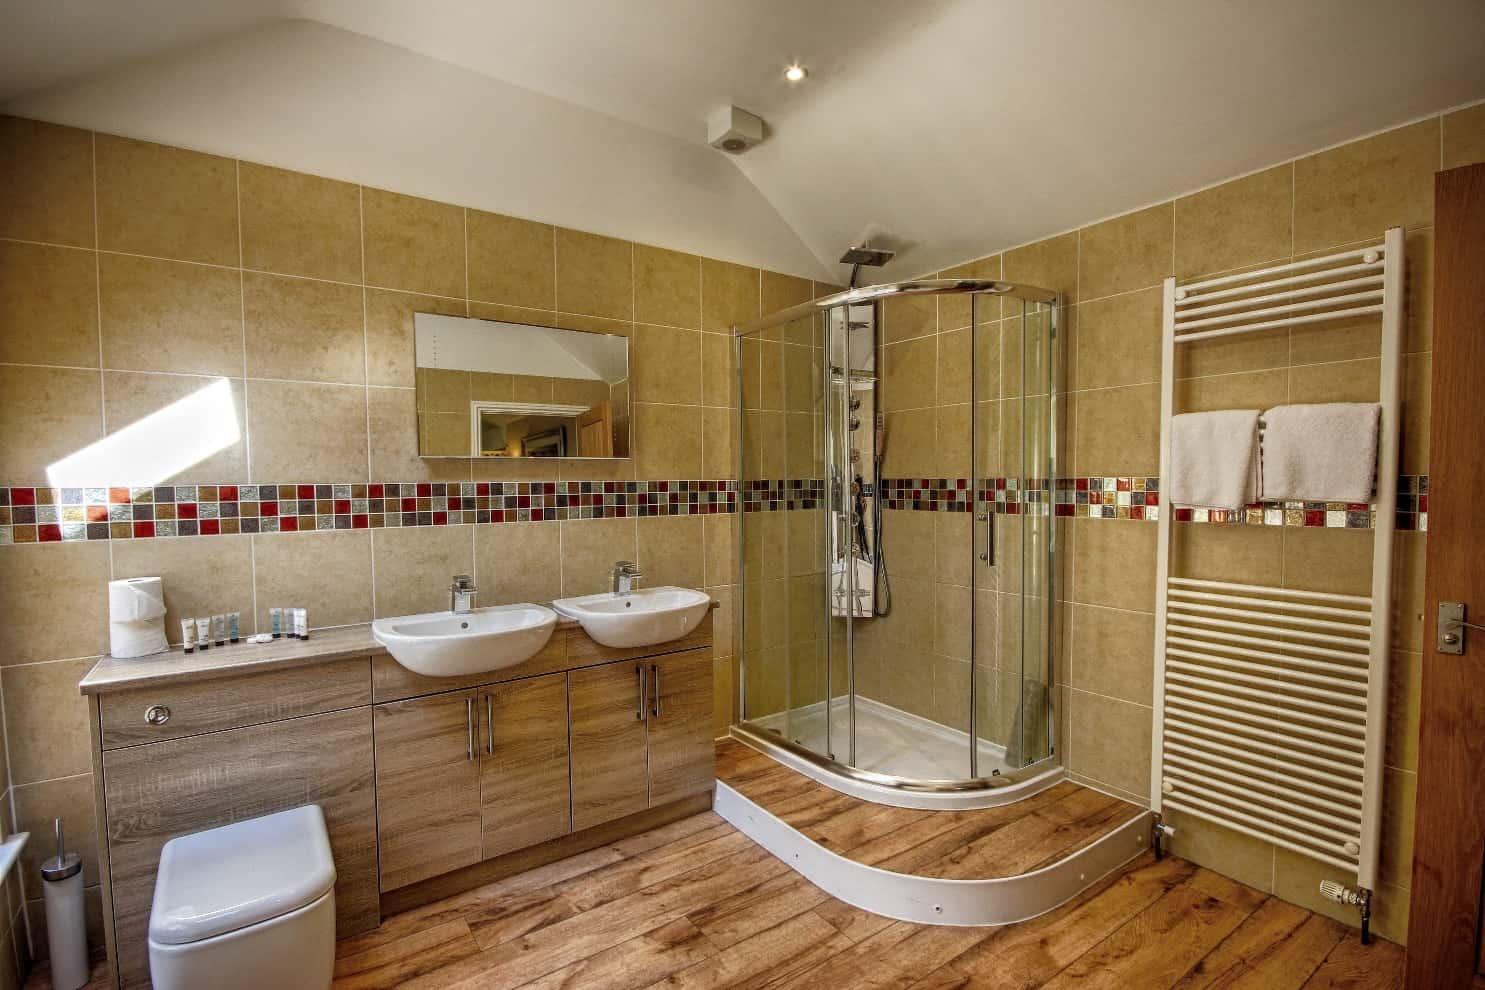 Willow Suites Bathroom Felbrigg Lodge Hotel North Norfolk